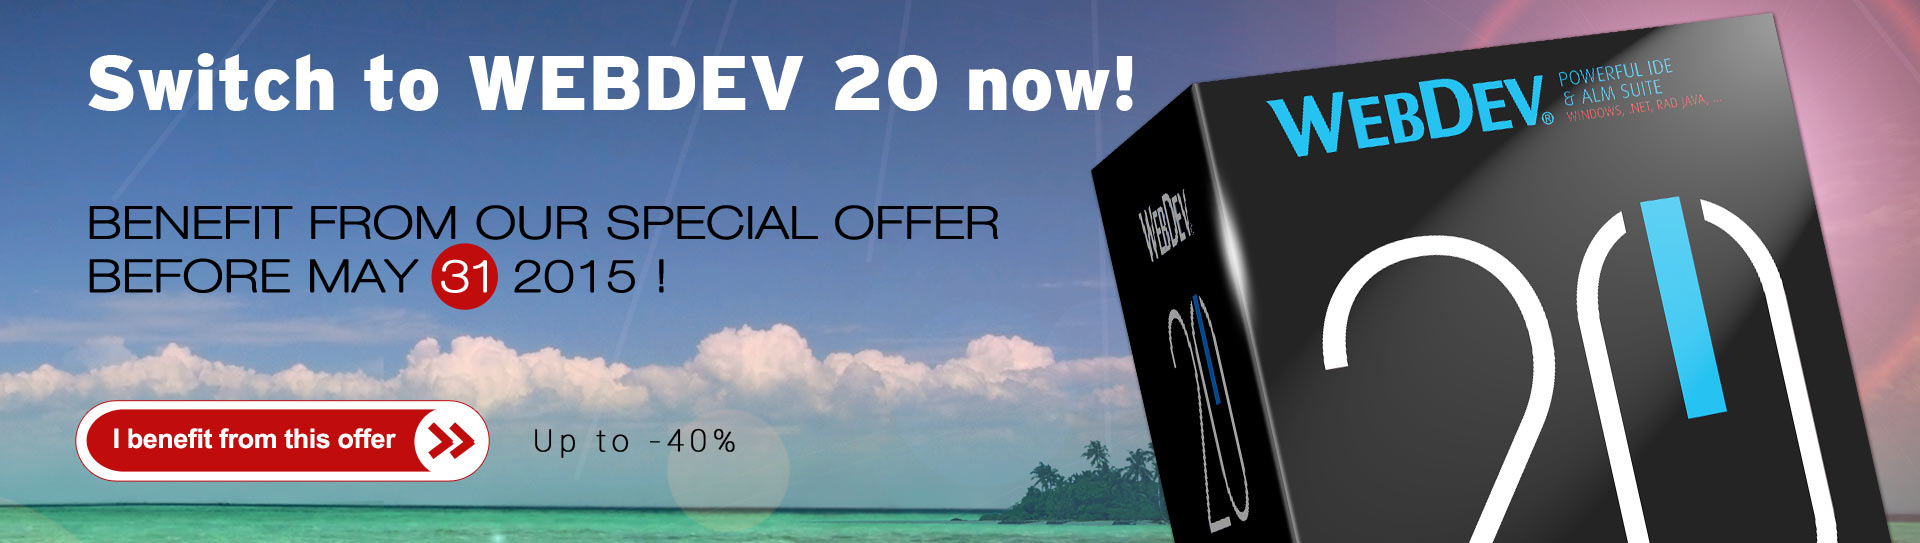 Switch to WEBDEV 20 now!